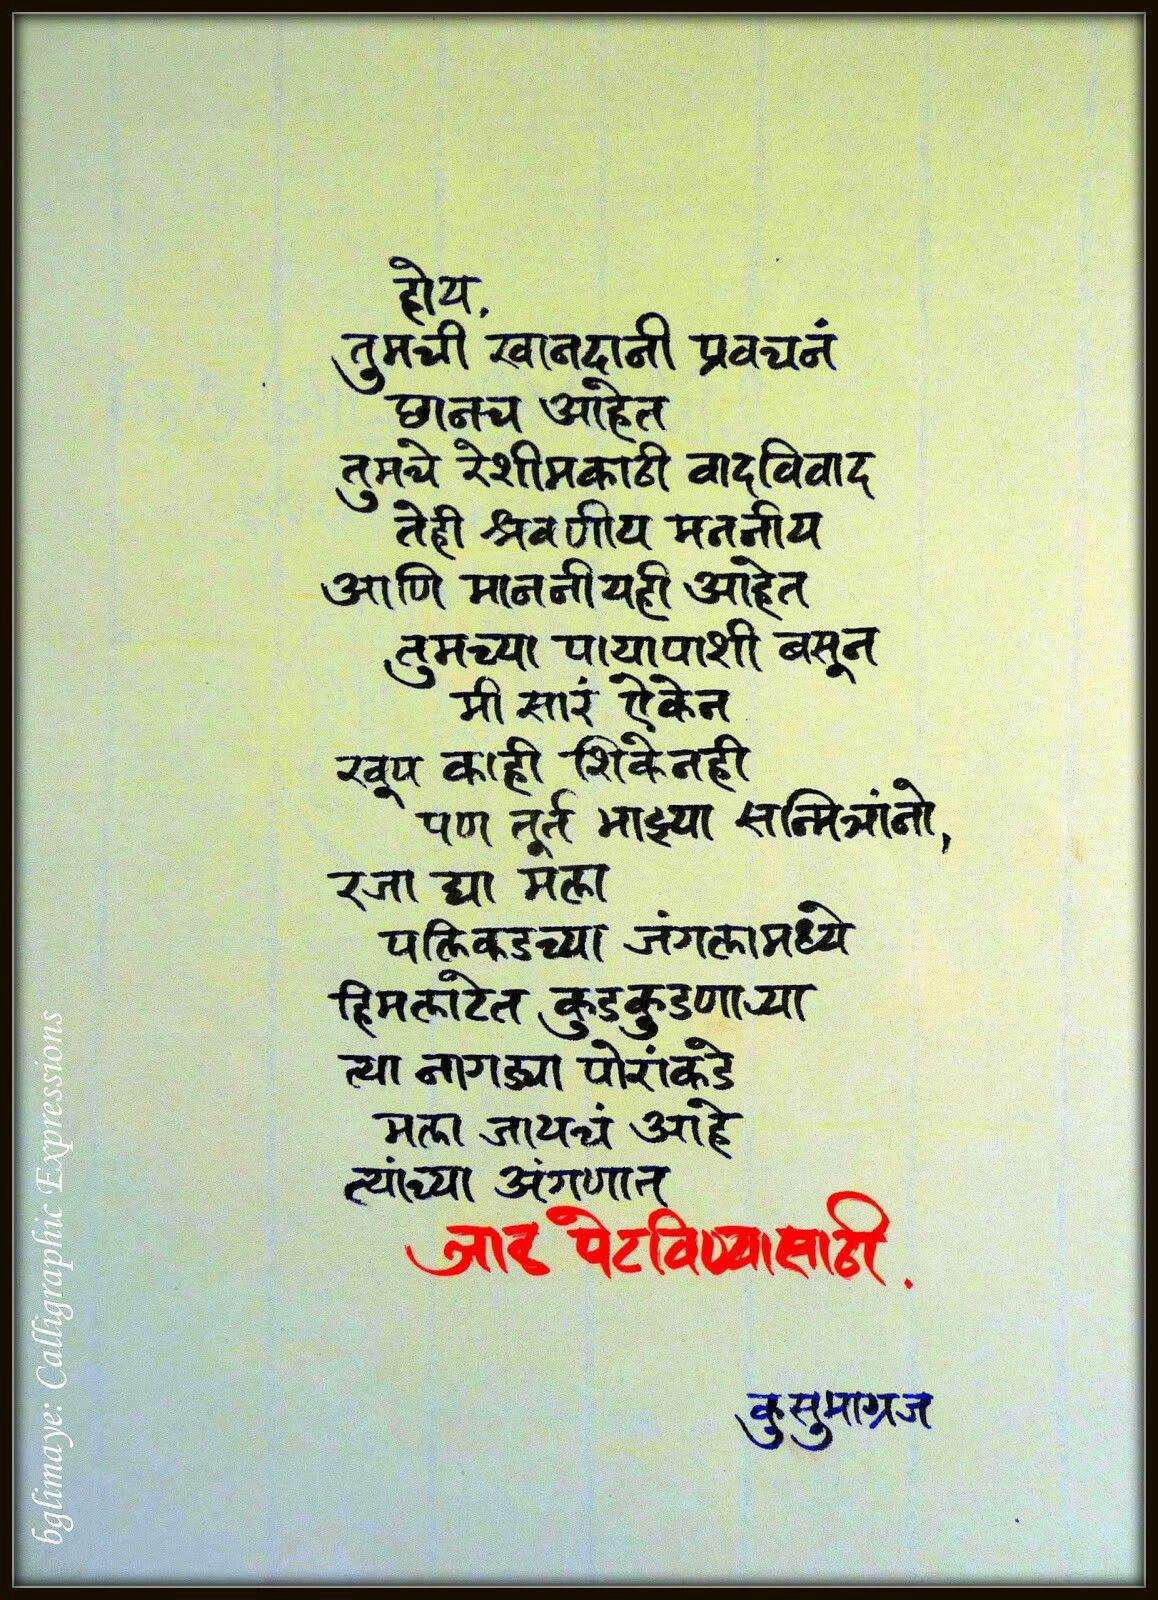 Pin by Bhushan on Calligraphy Feelings words, Marathi